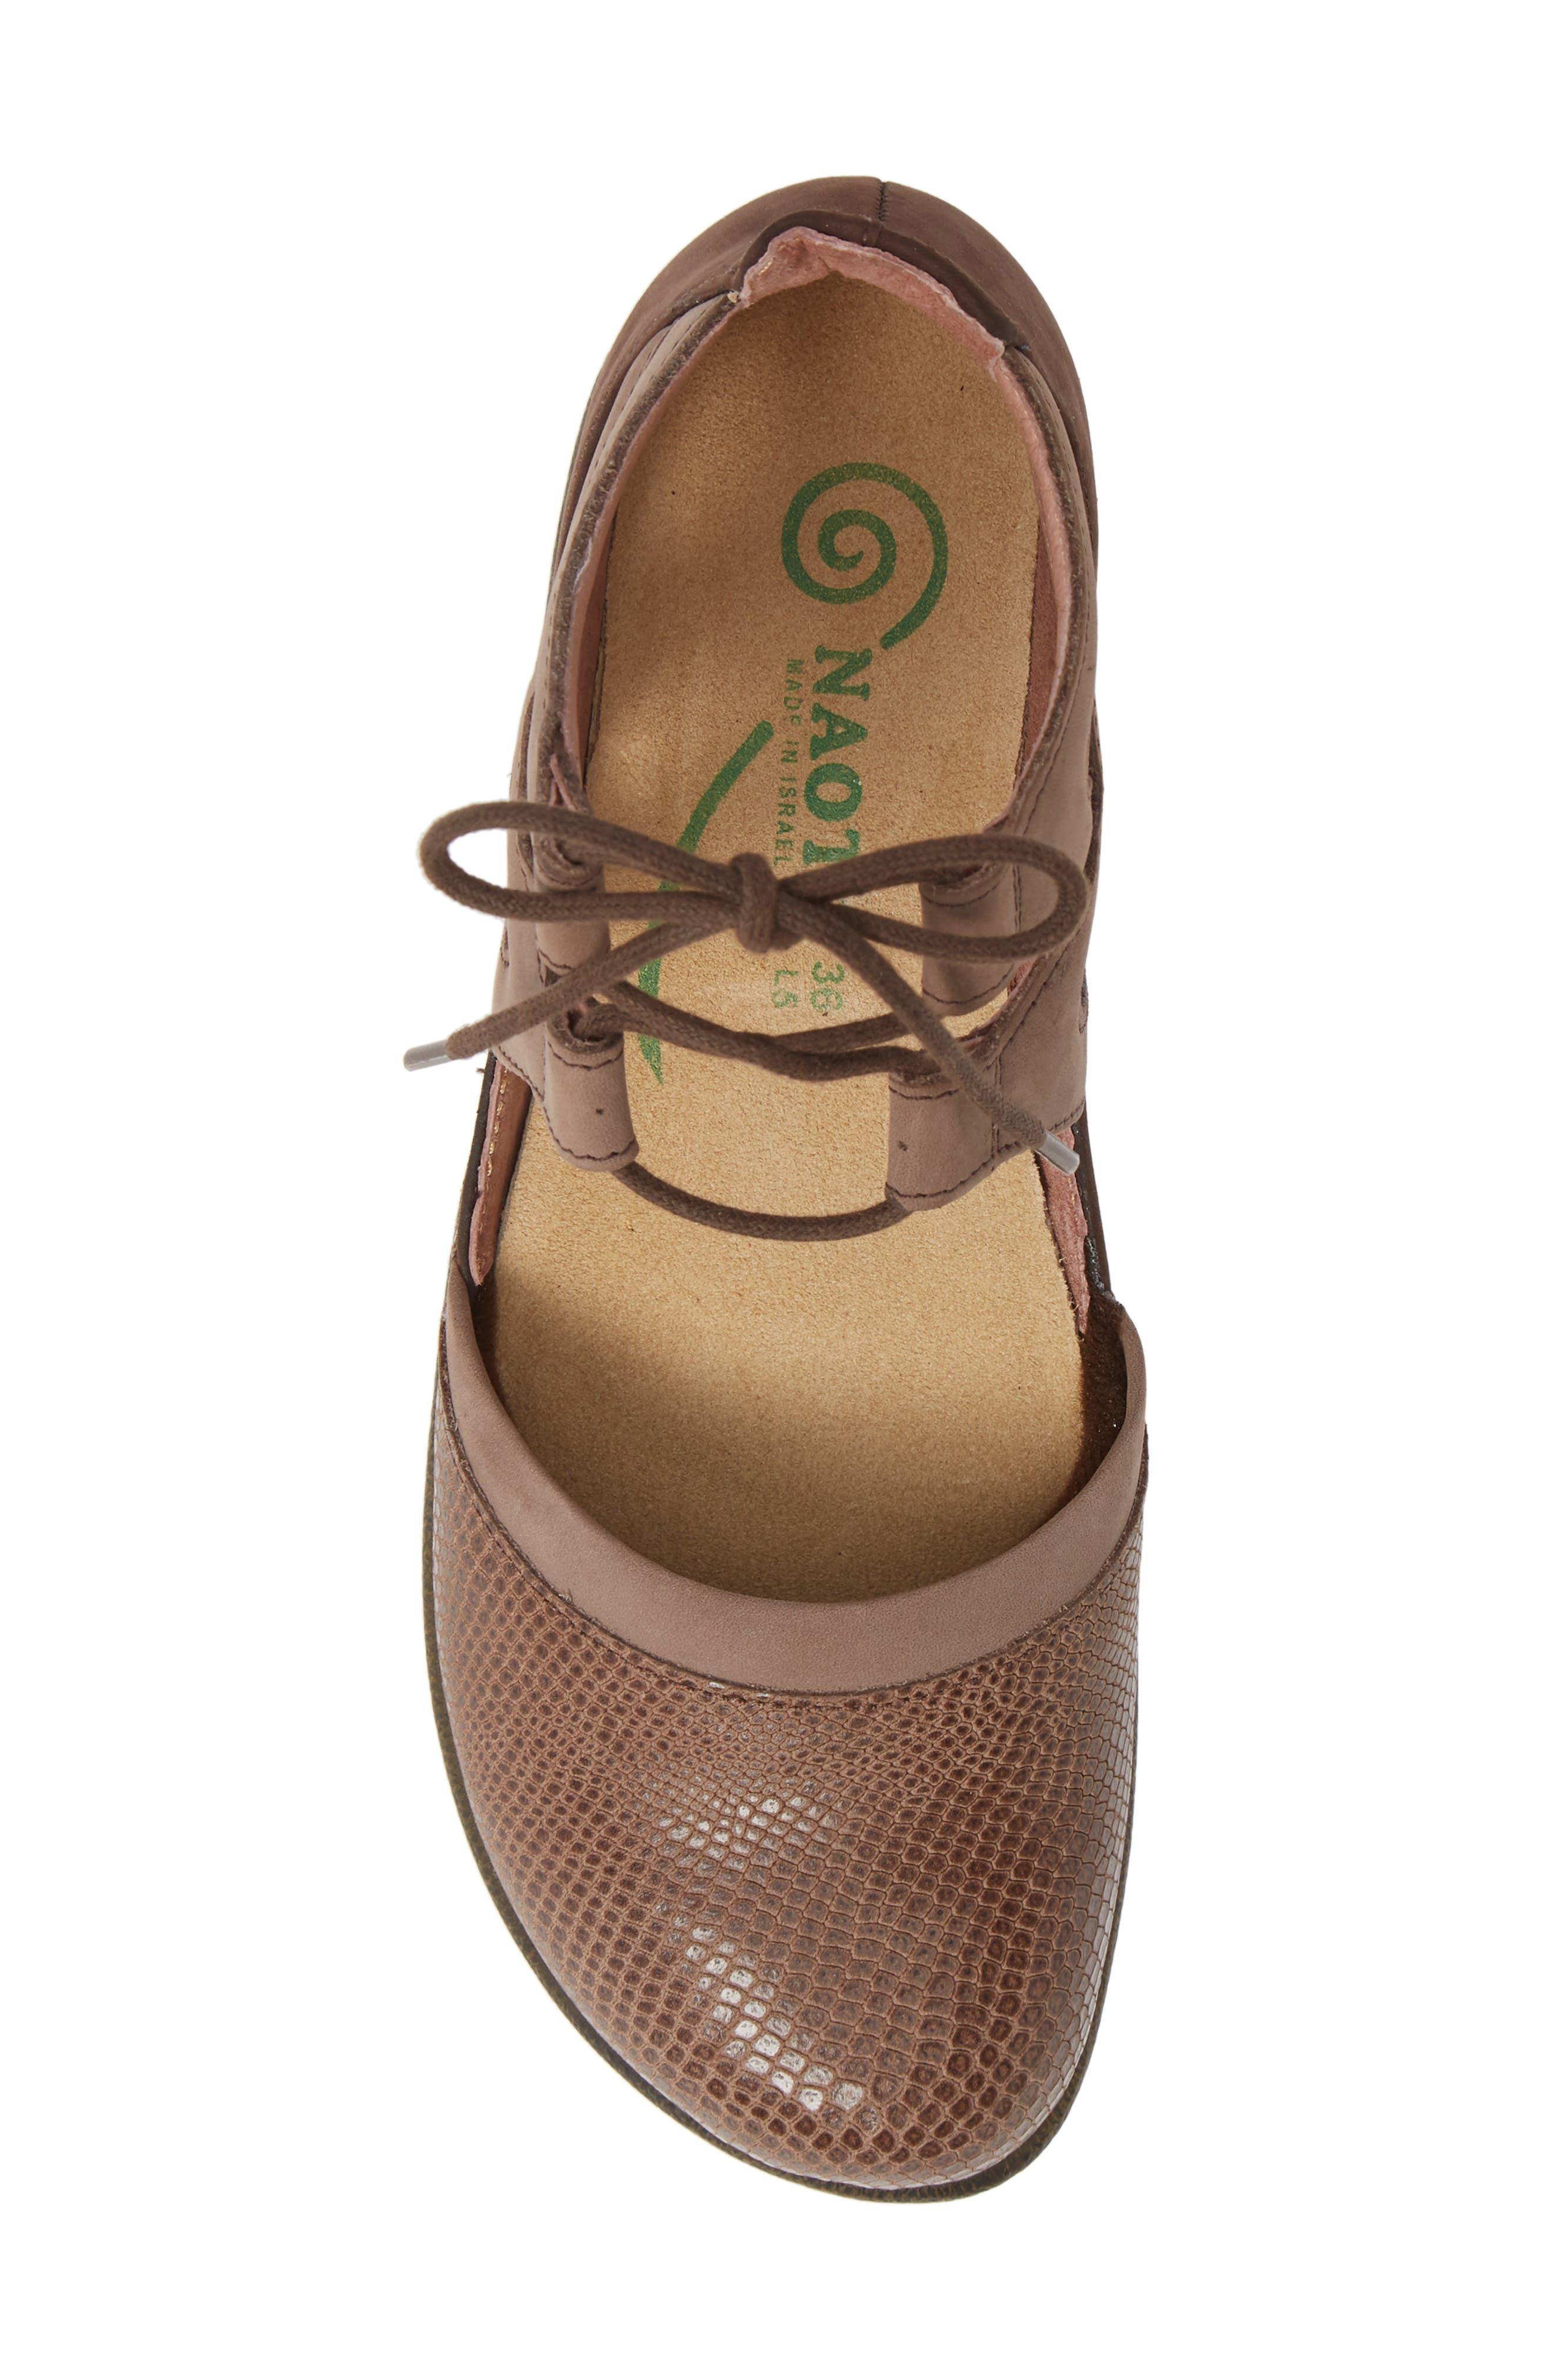 NAOT, Kata Lace-Up Sandal, Alternate thumbnail 5, color, BROWN/ SHIITAKE LEATHER